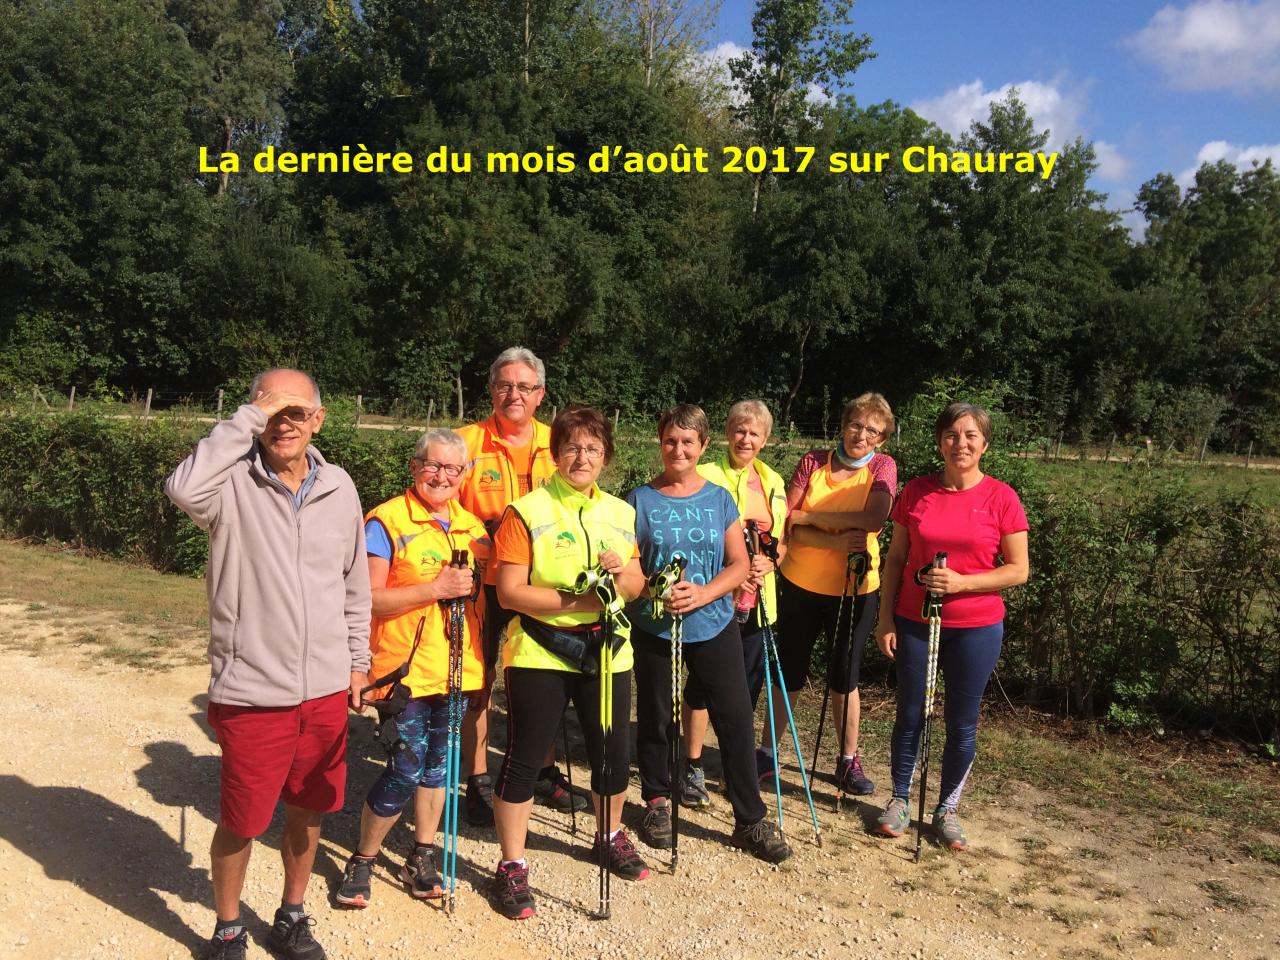 Chauray le jeudi 31 aout 2017